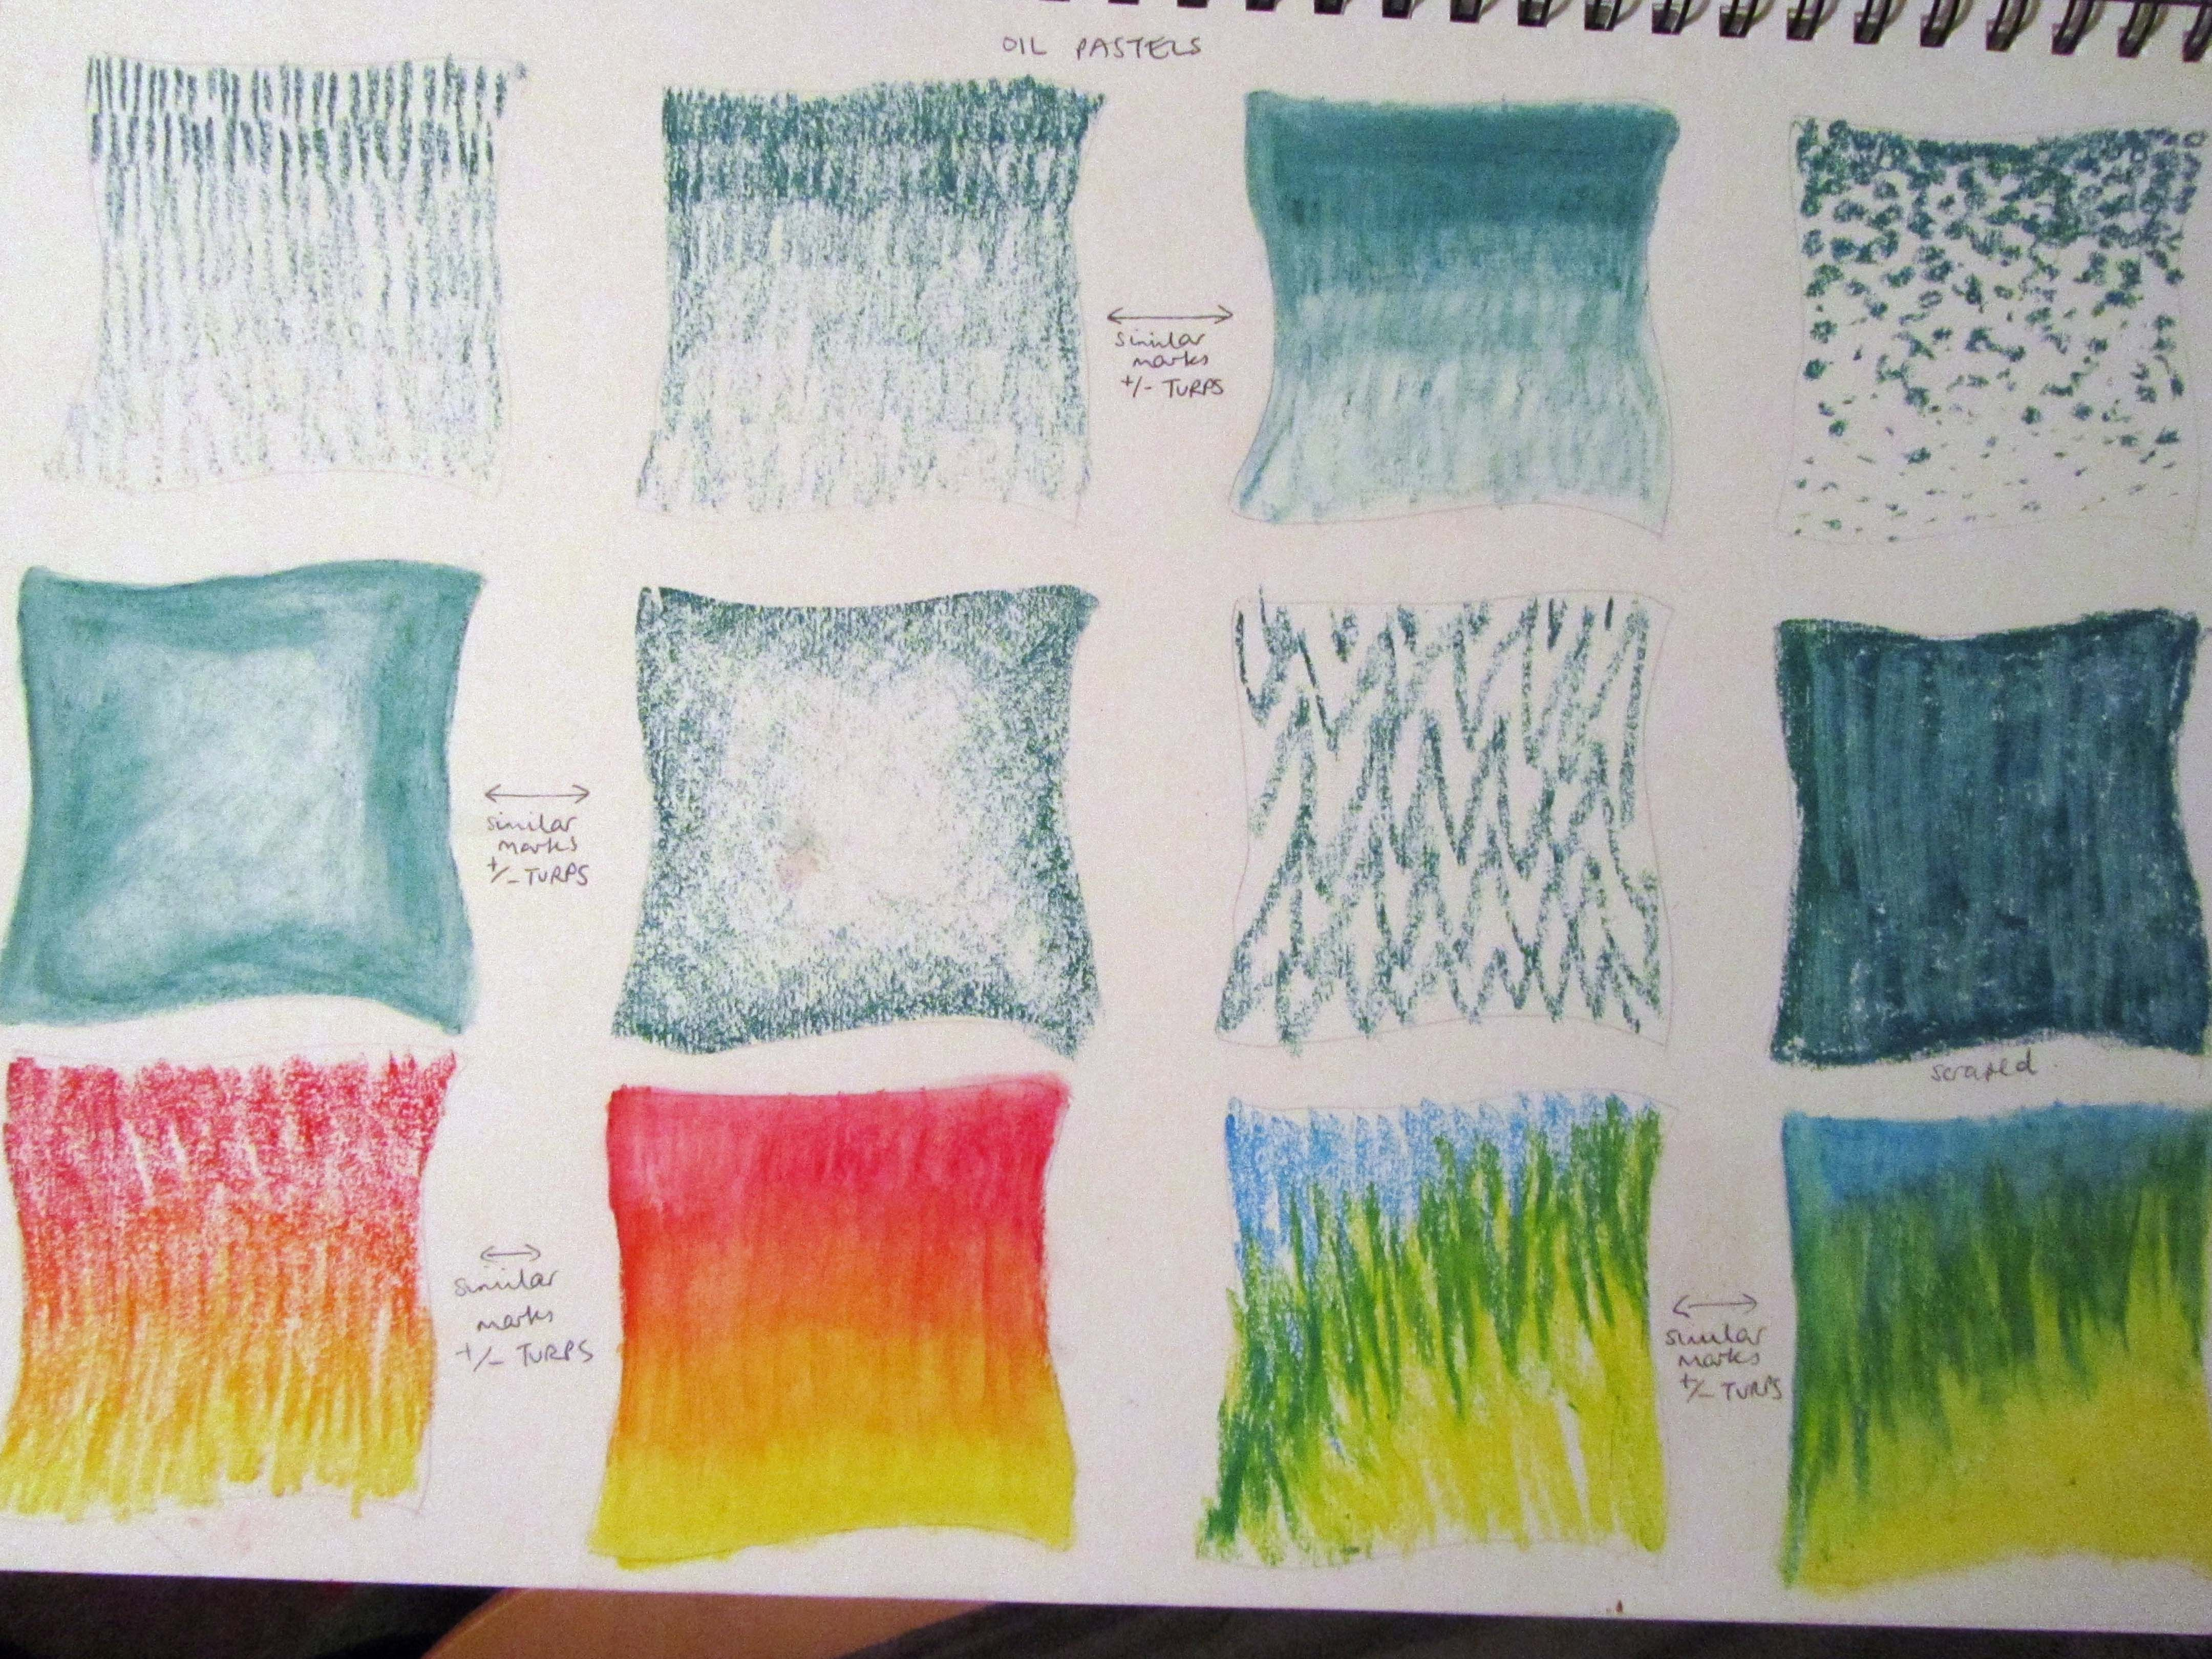 soft pastels beginners - Bing images | Art | Pinterest ...